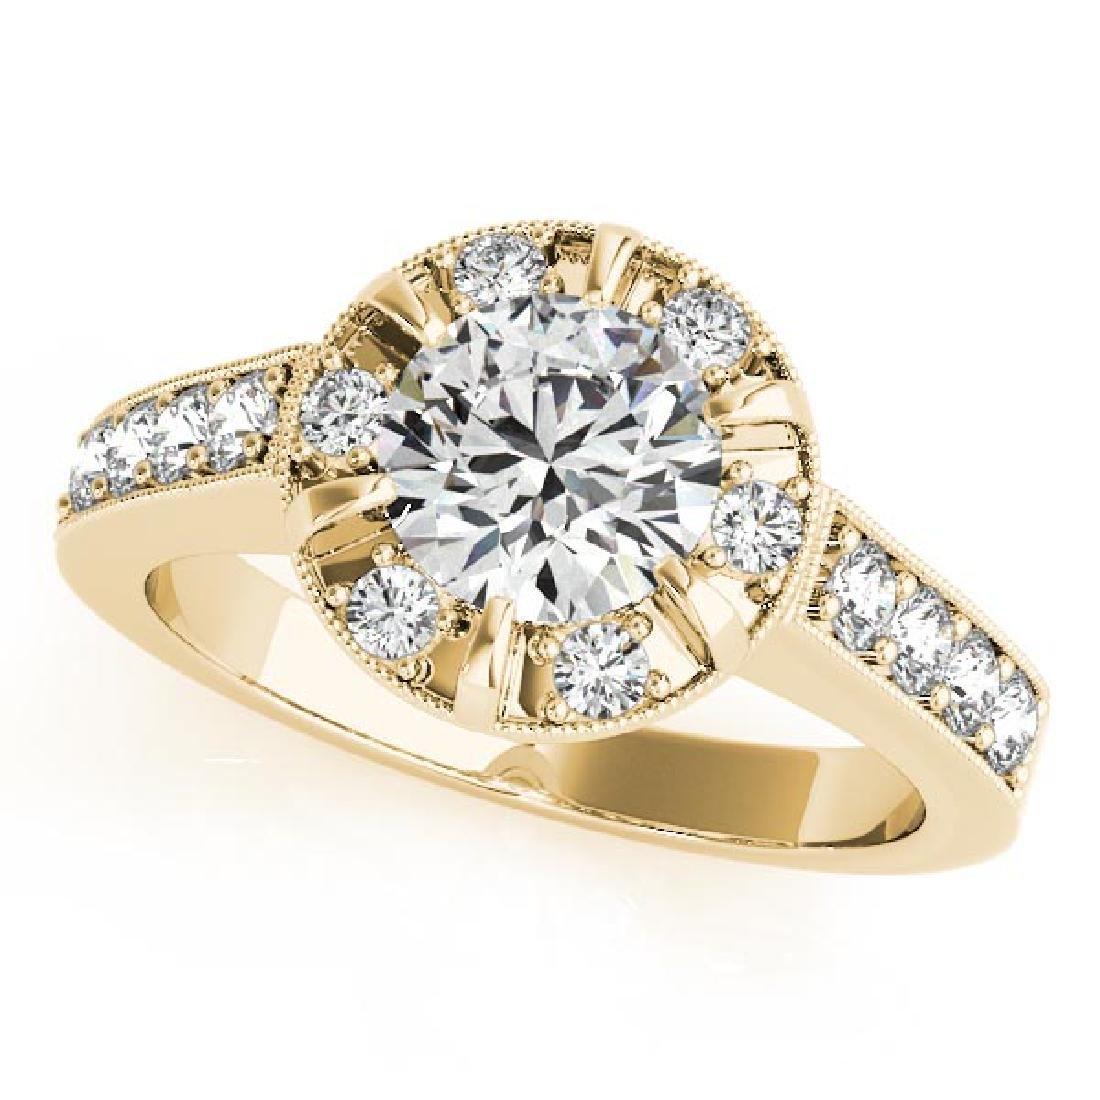 CERTIFIED 18K YELLOW GOLD 1.25 CT G-H/VS-SI1 DIAMOND HA